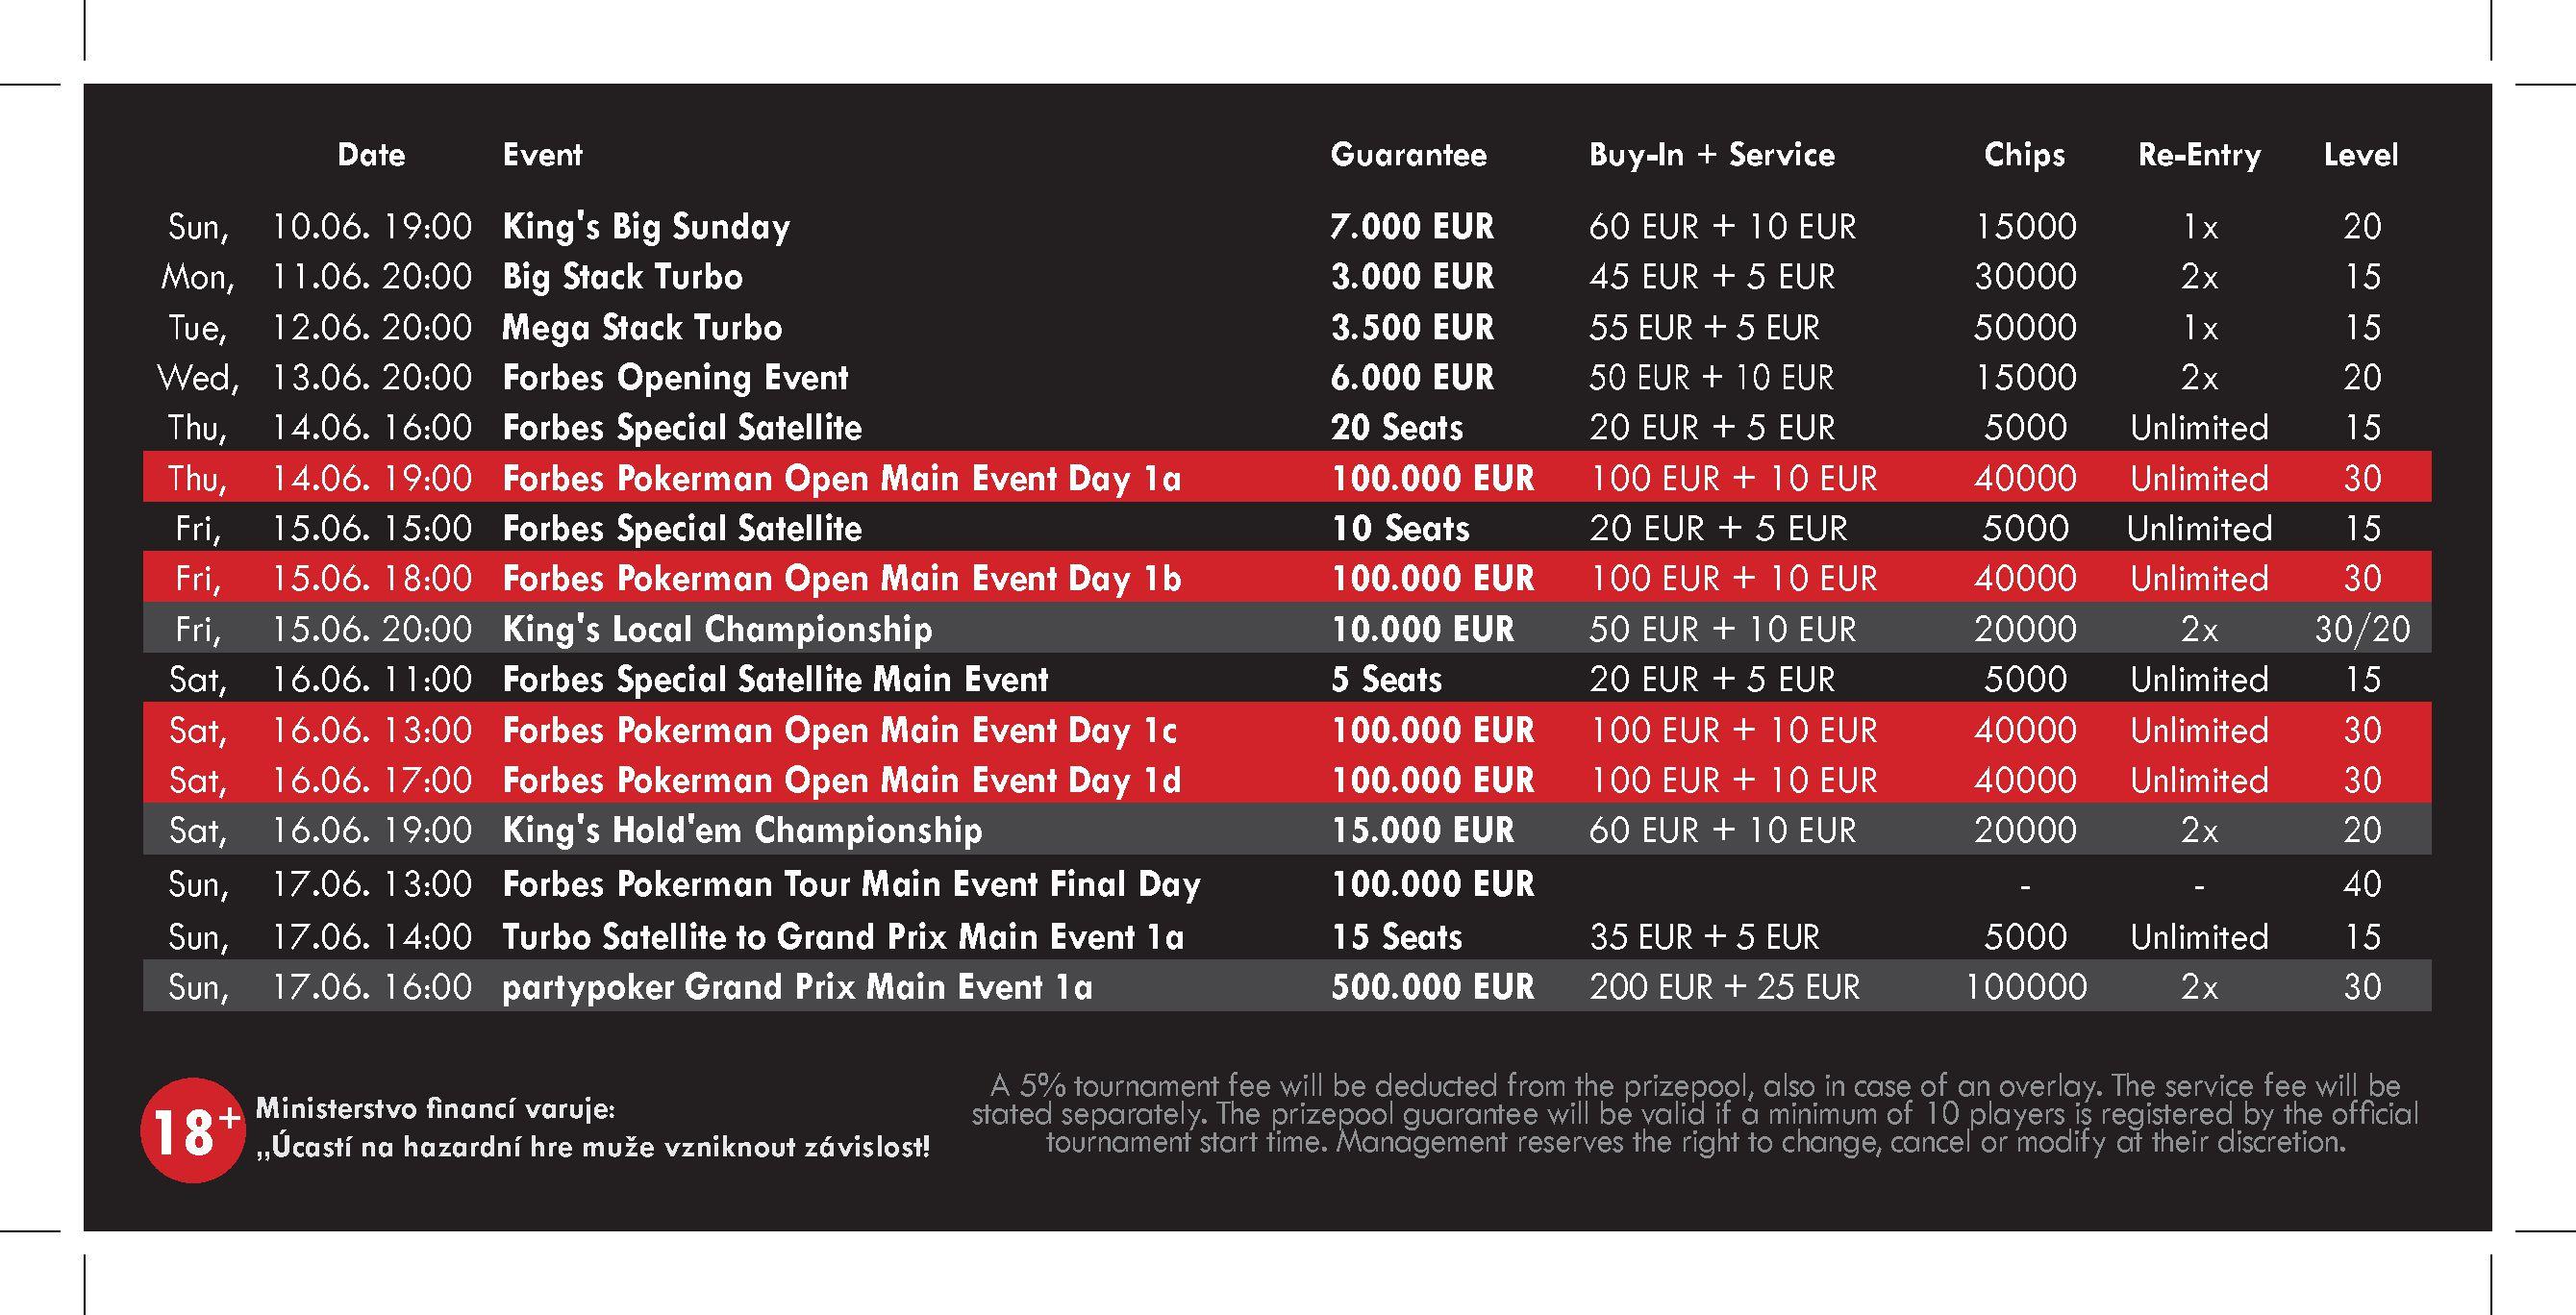 Schedule Forbes Pokerman